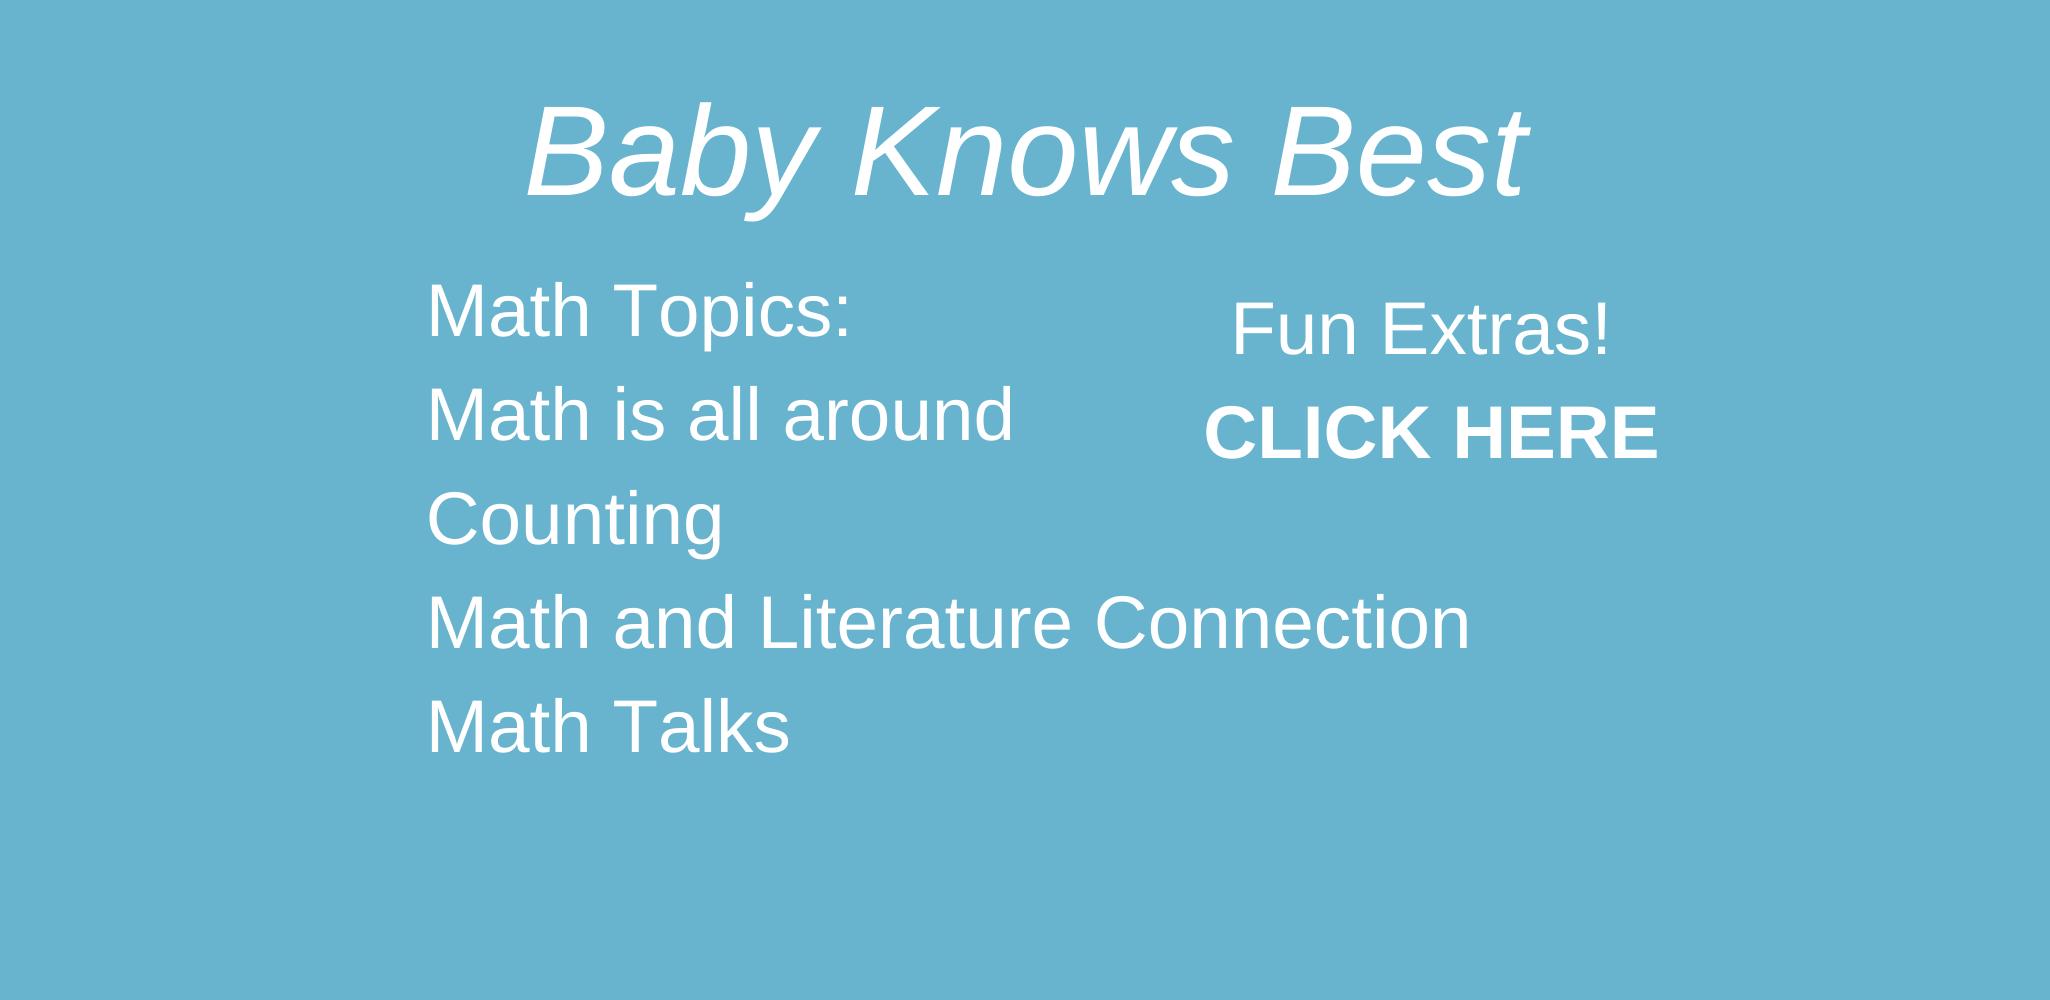 Baby Knows Best Resources